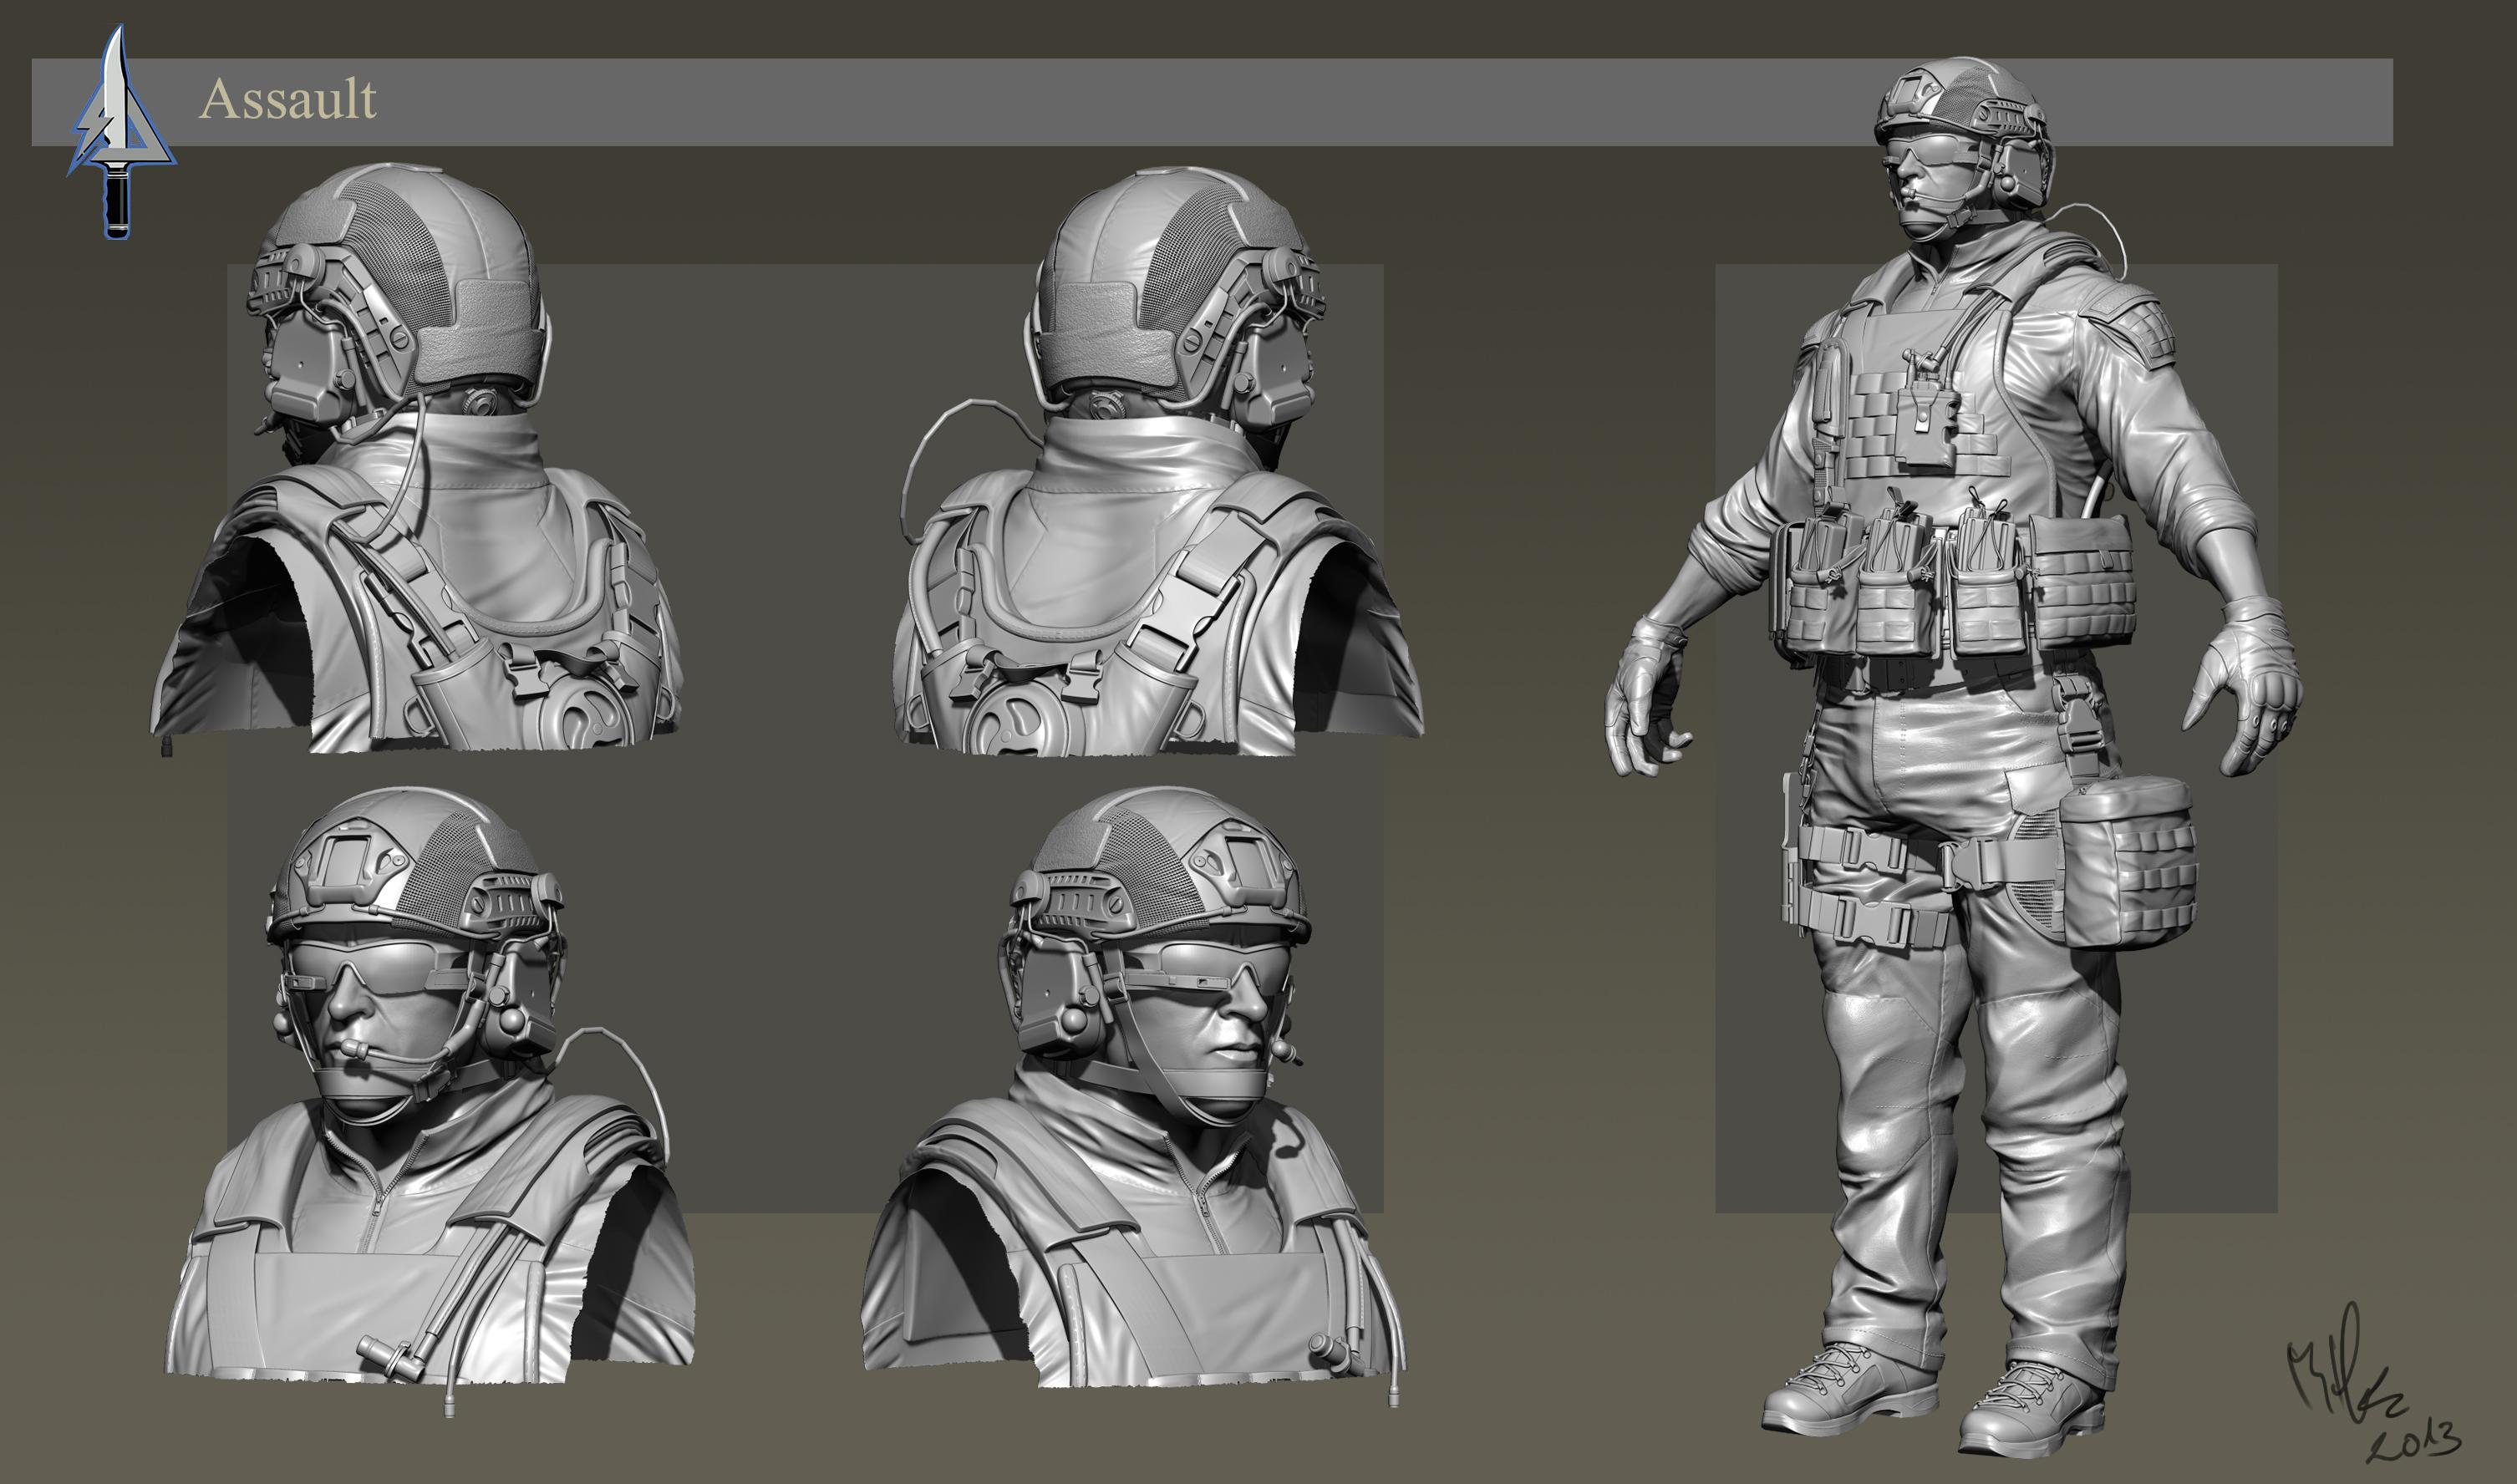 soldier_by_michalhoz-d6qmy03.jpg